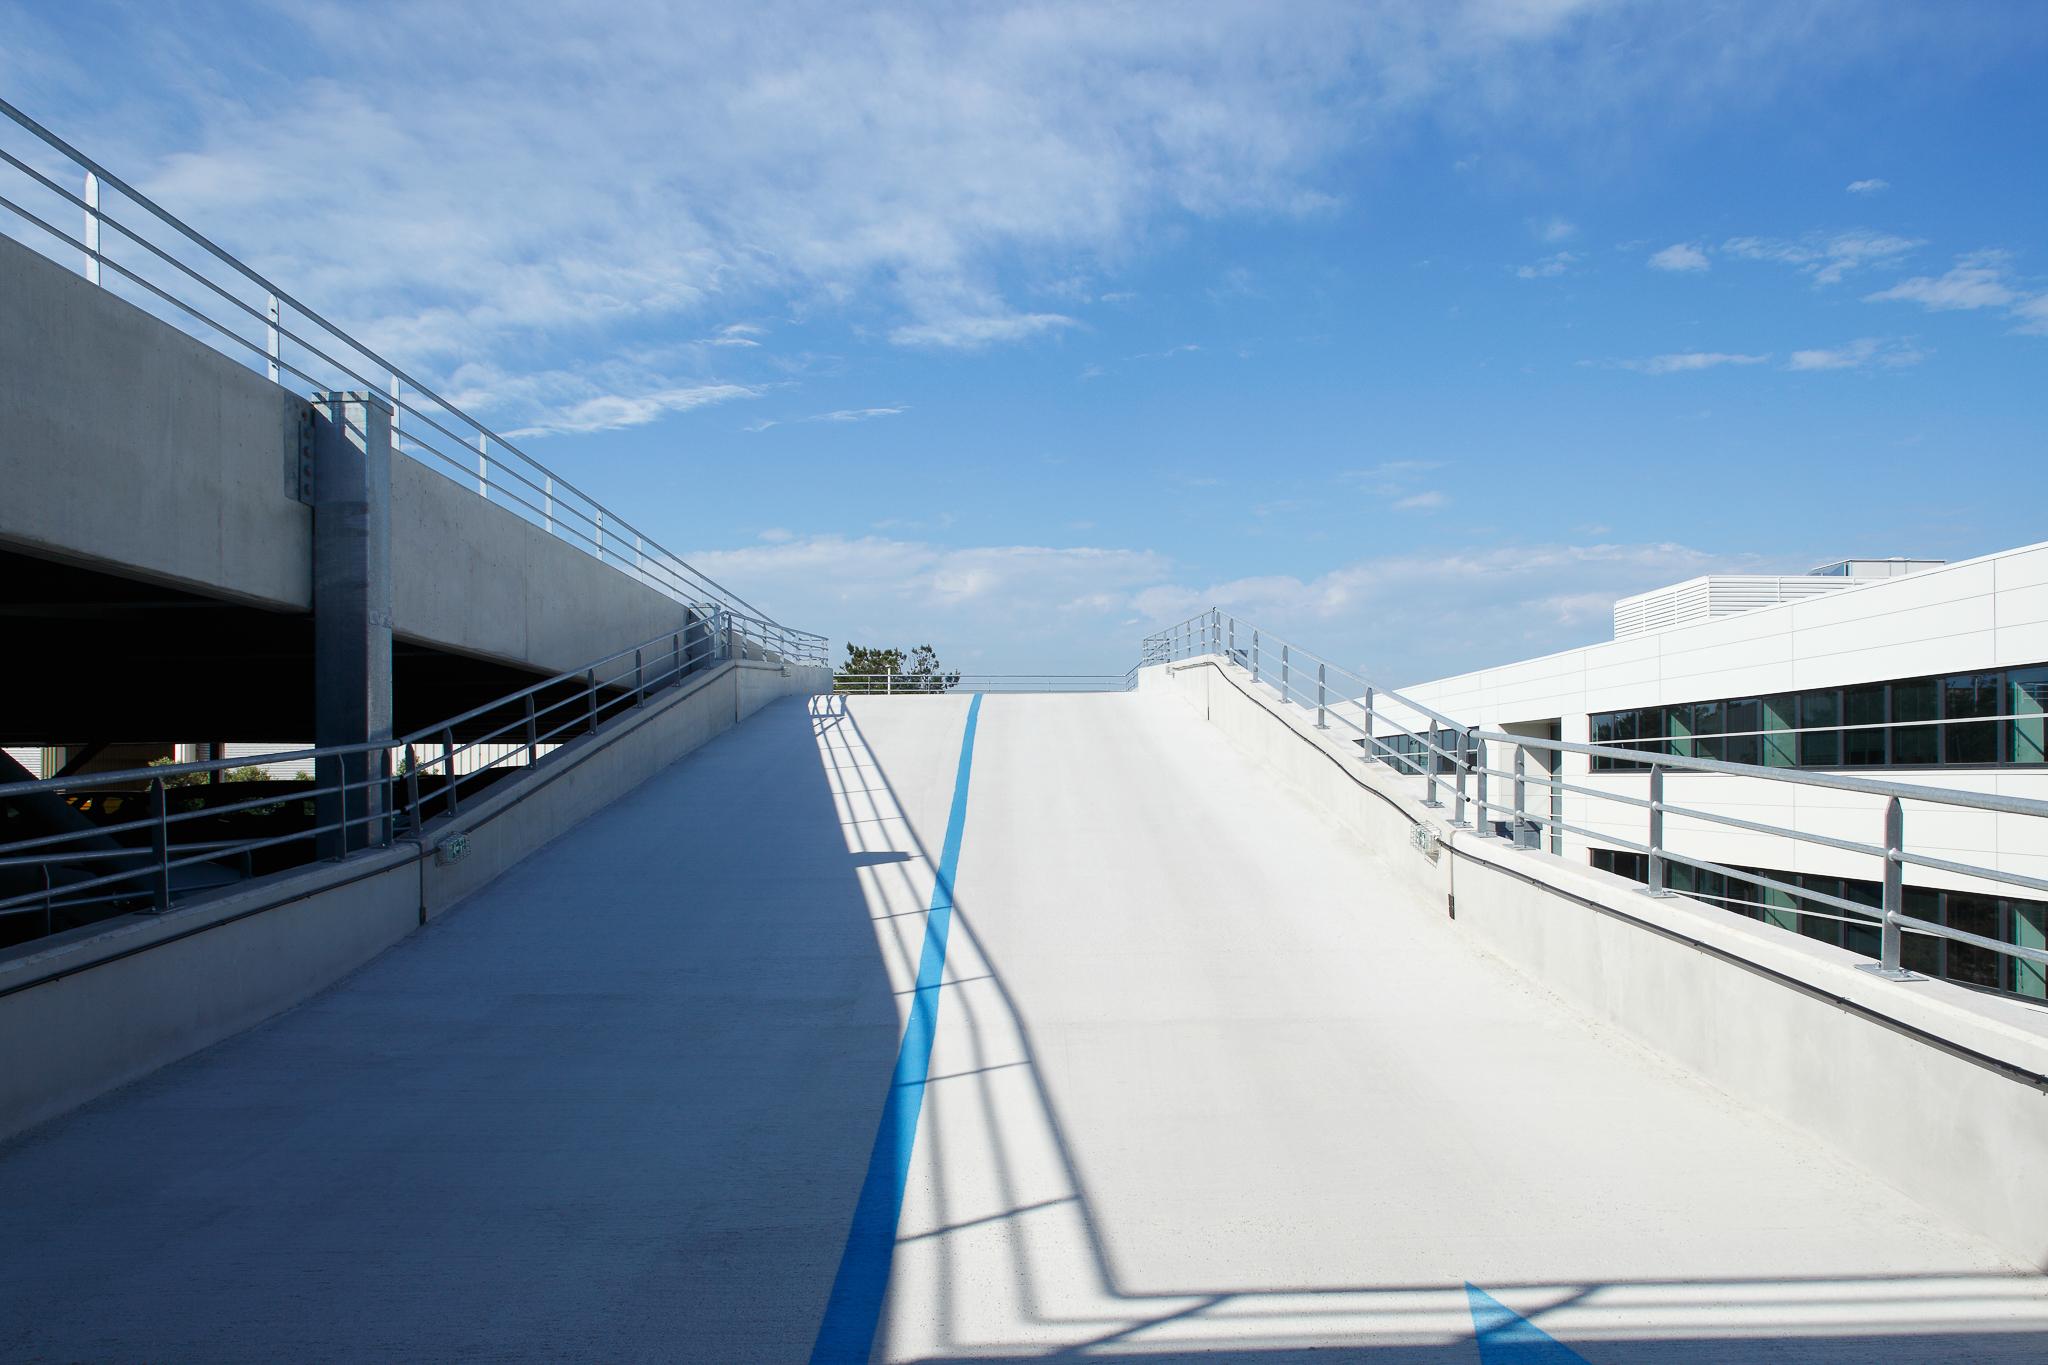 lazard eurosud vitrolles parking silo stationnement gagnepark GPK